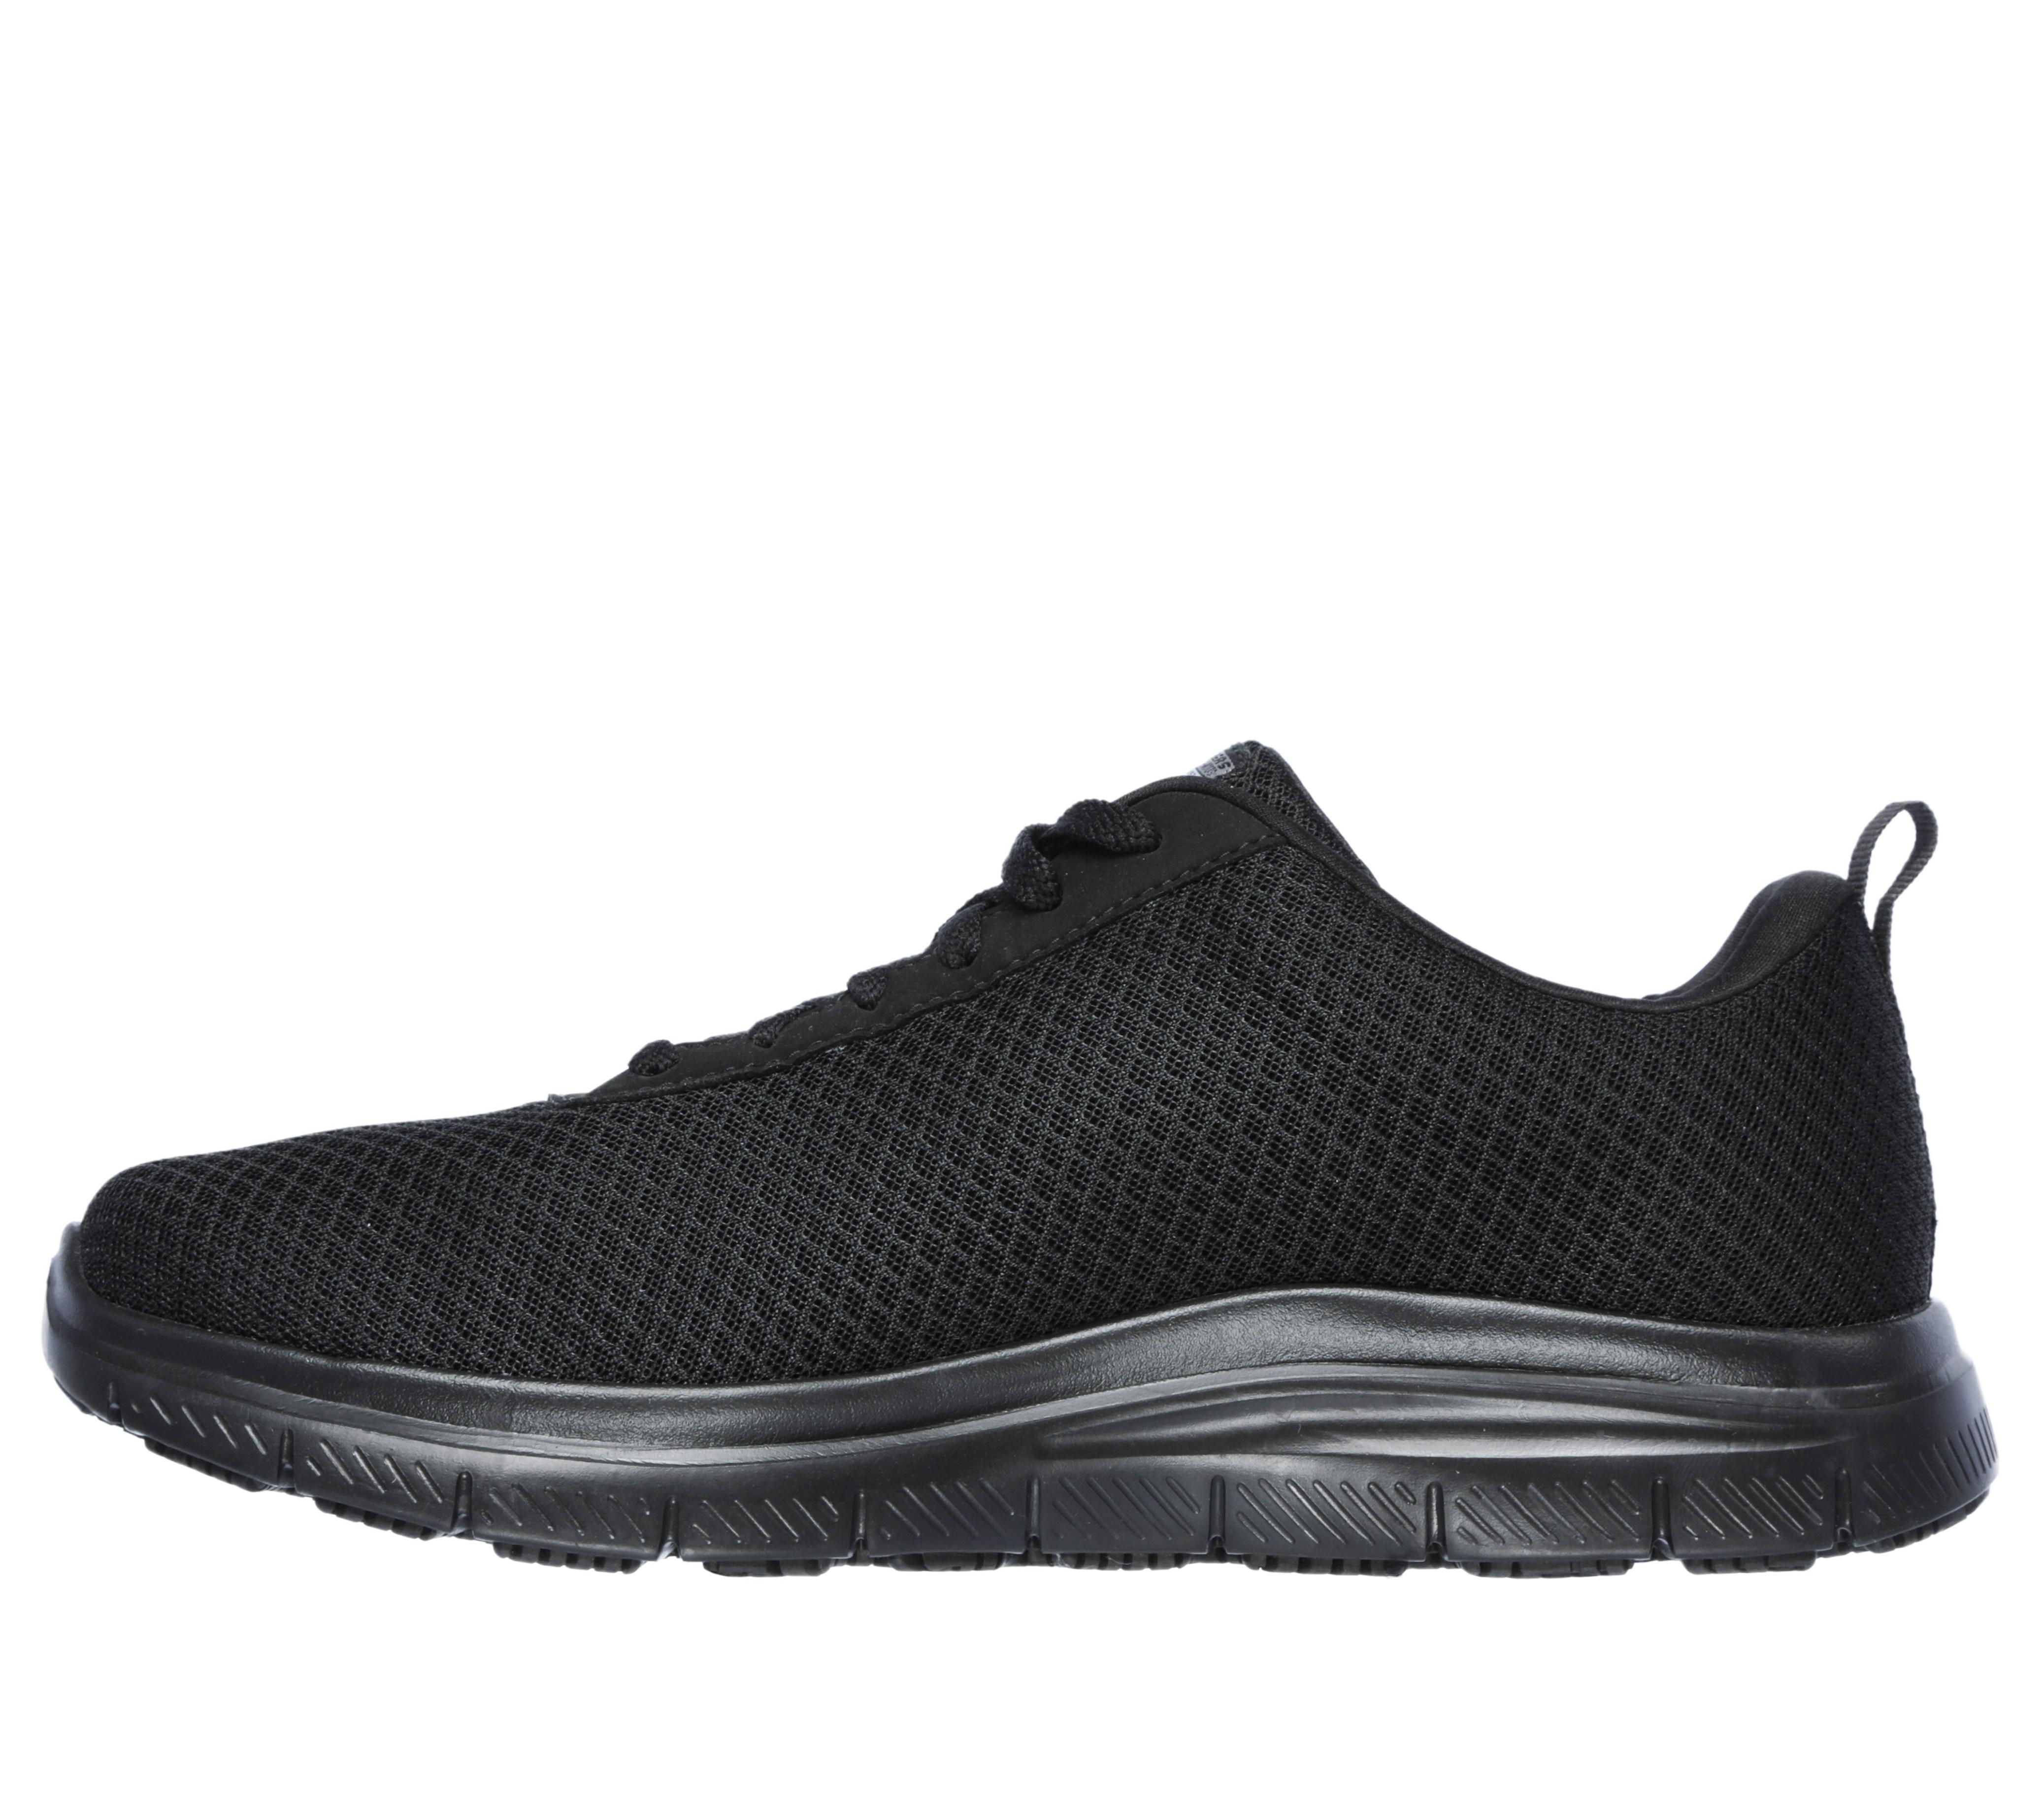 Skechers Work Relaxed Fit FLEX VANTAGGIO-Bendon SR Scarpe 77125EC Sneaker Uomo